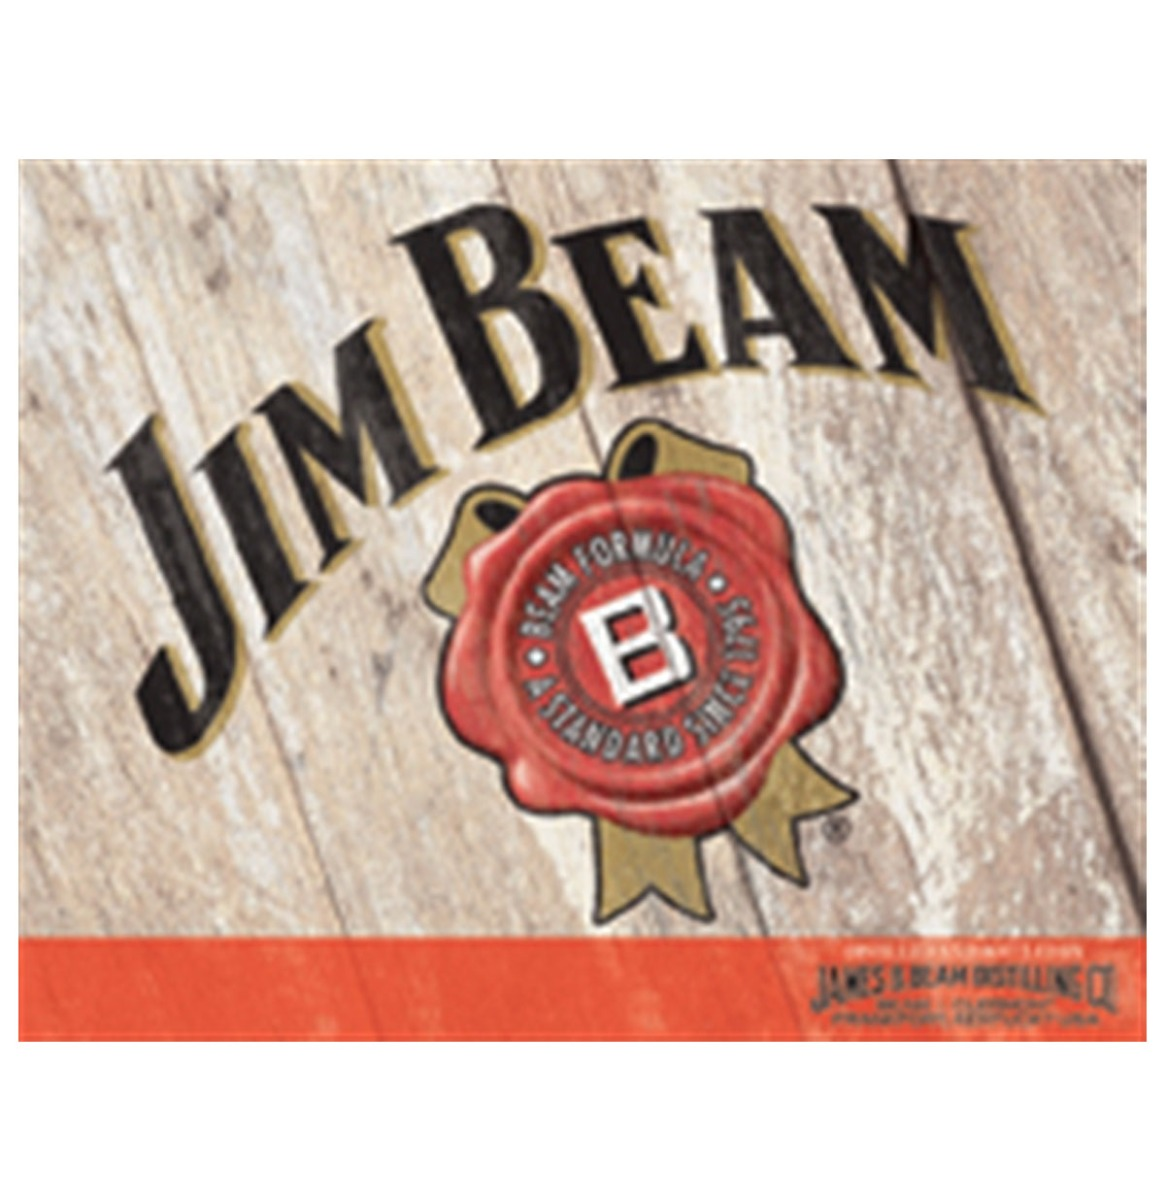 Jim Beam Metalen Bord - 41 x 31 cm